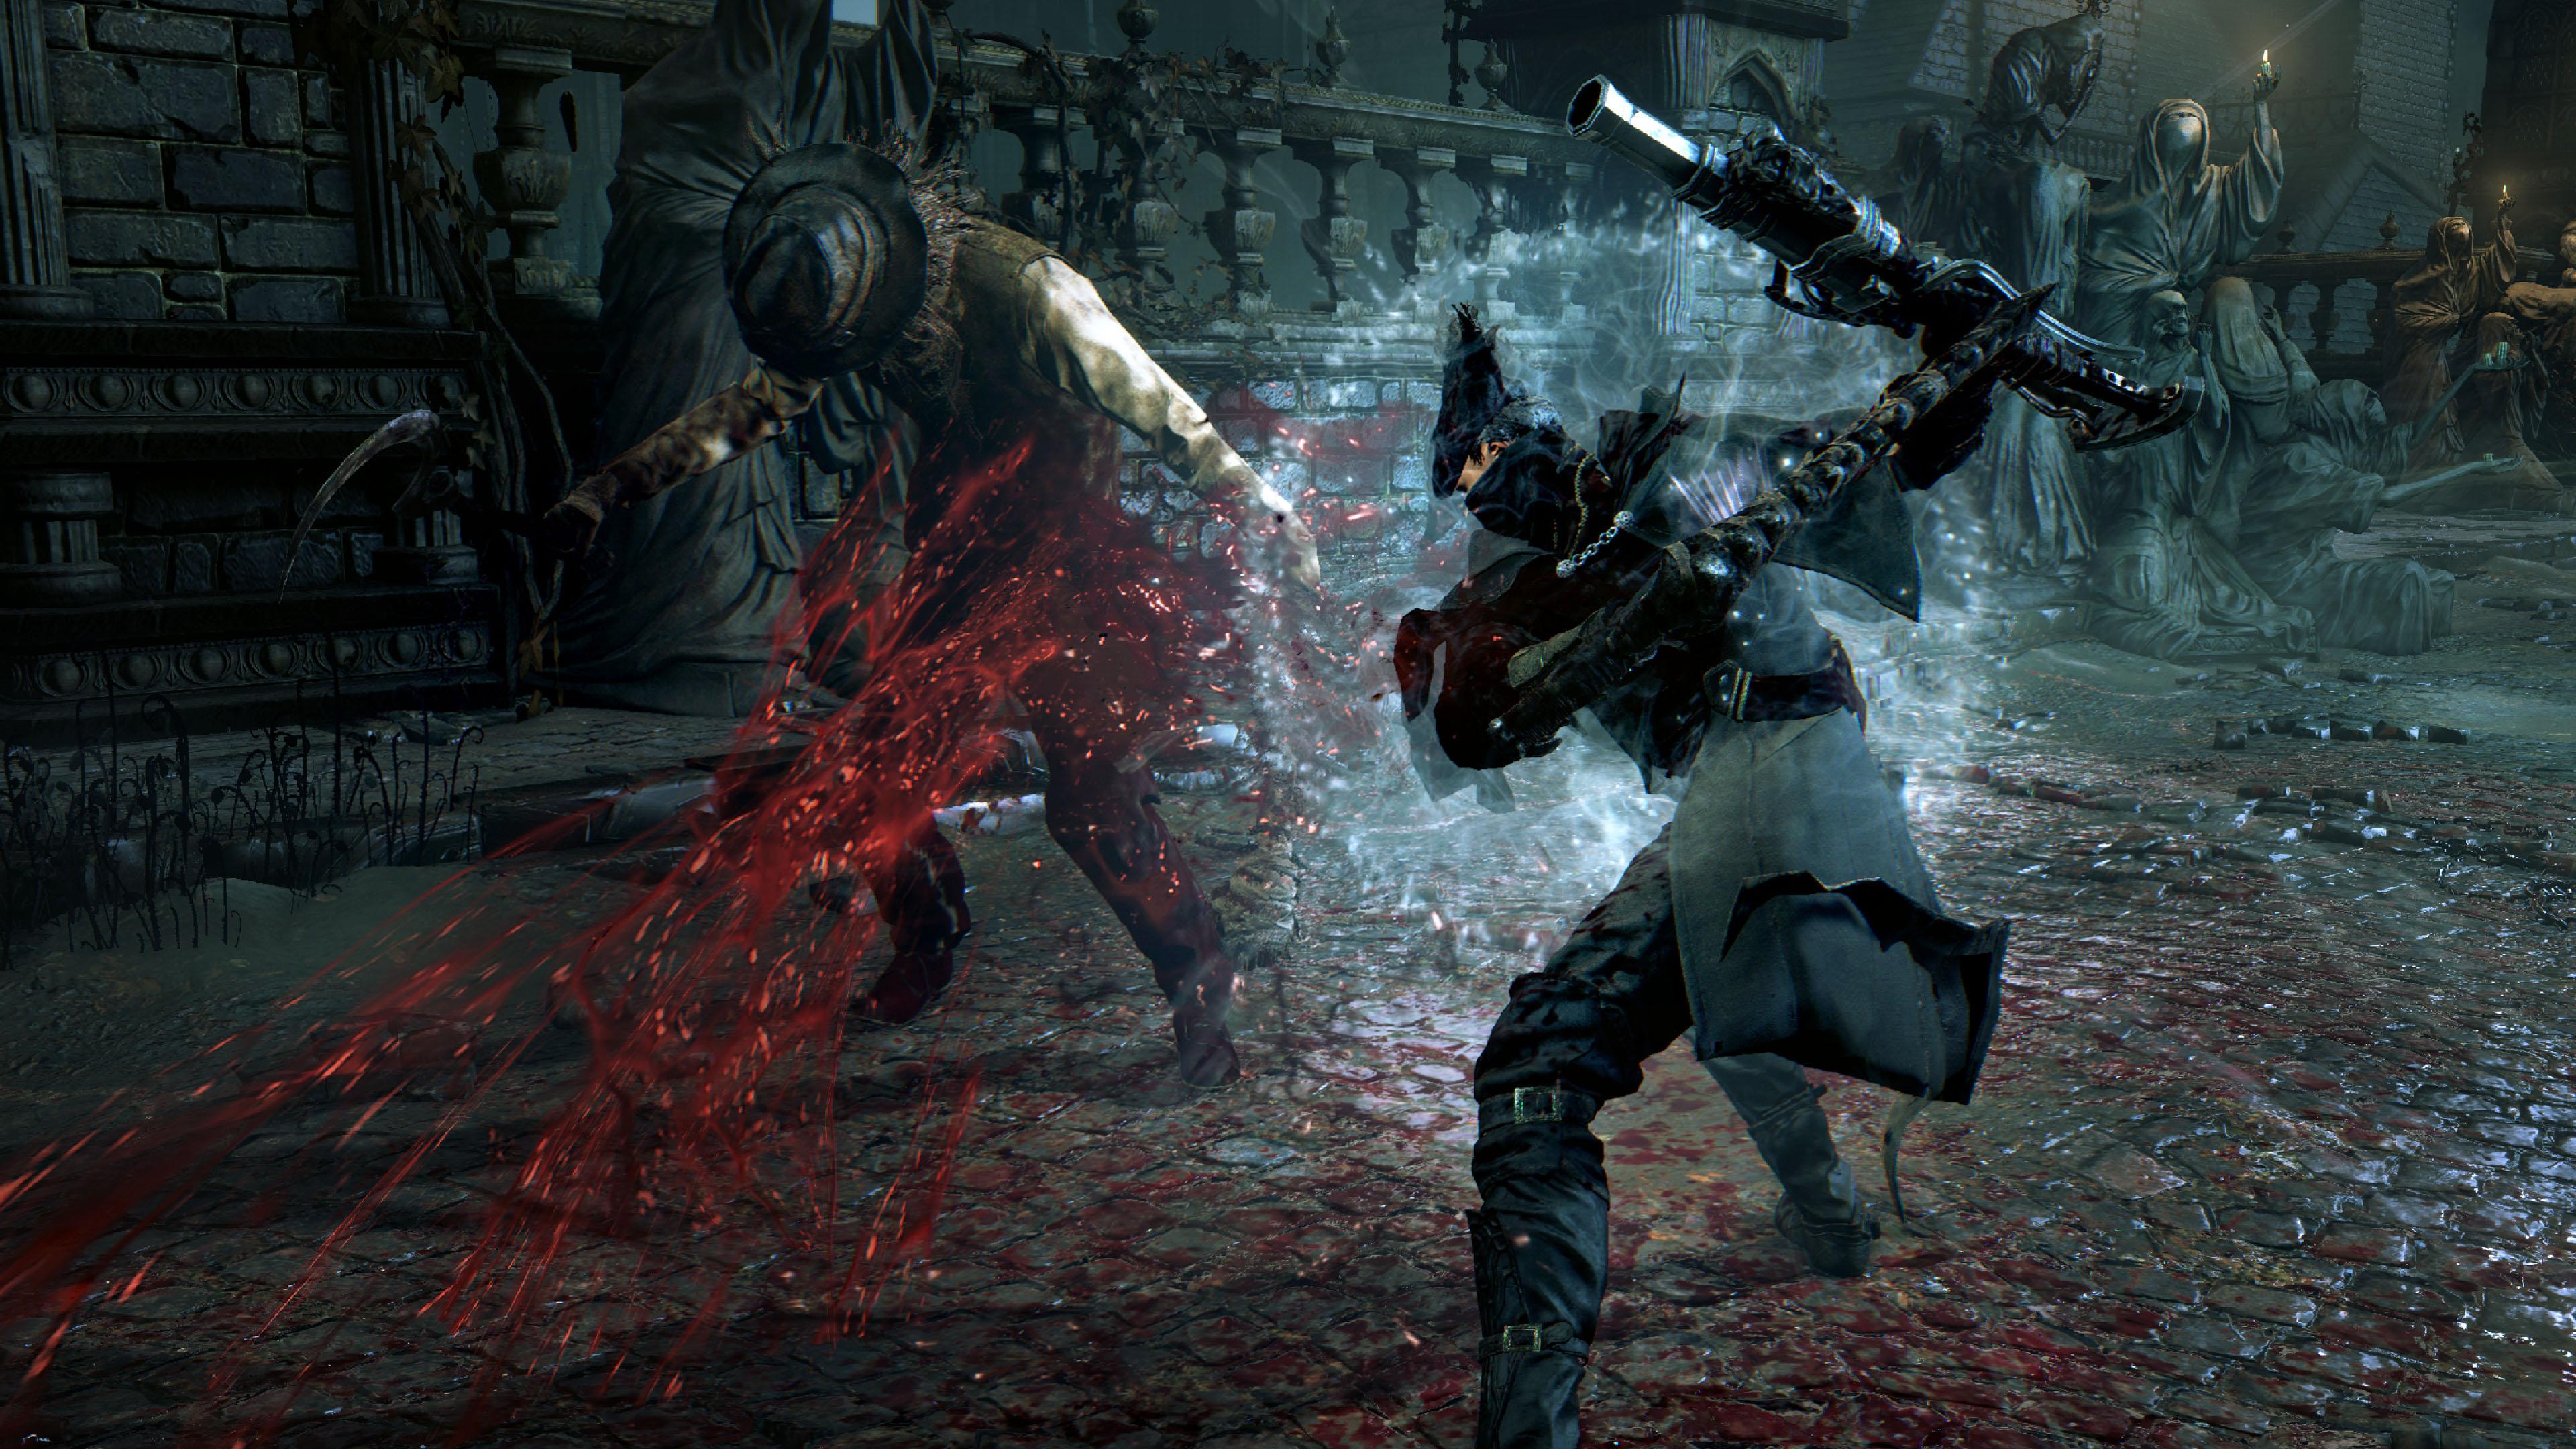 Bloodborne 4k ultra hd wallpaper and background image - Bloodborne download ...